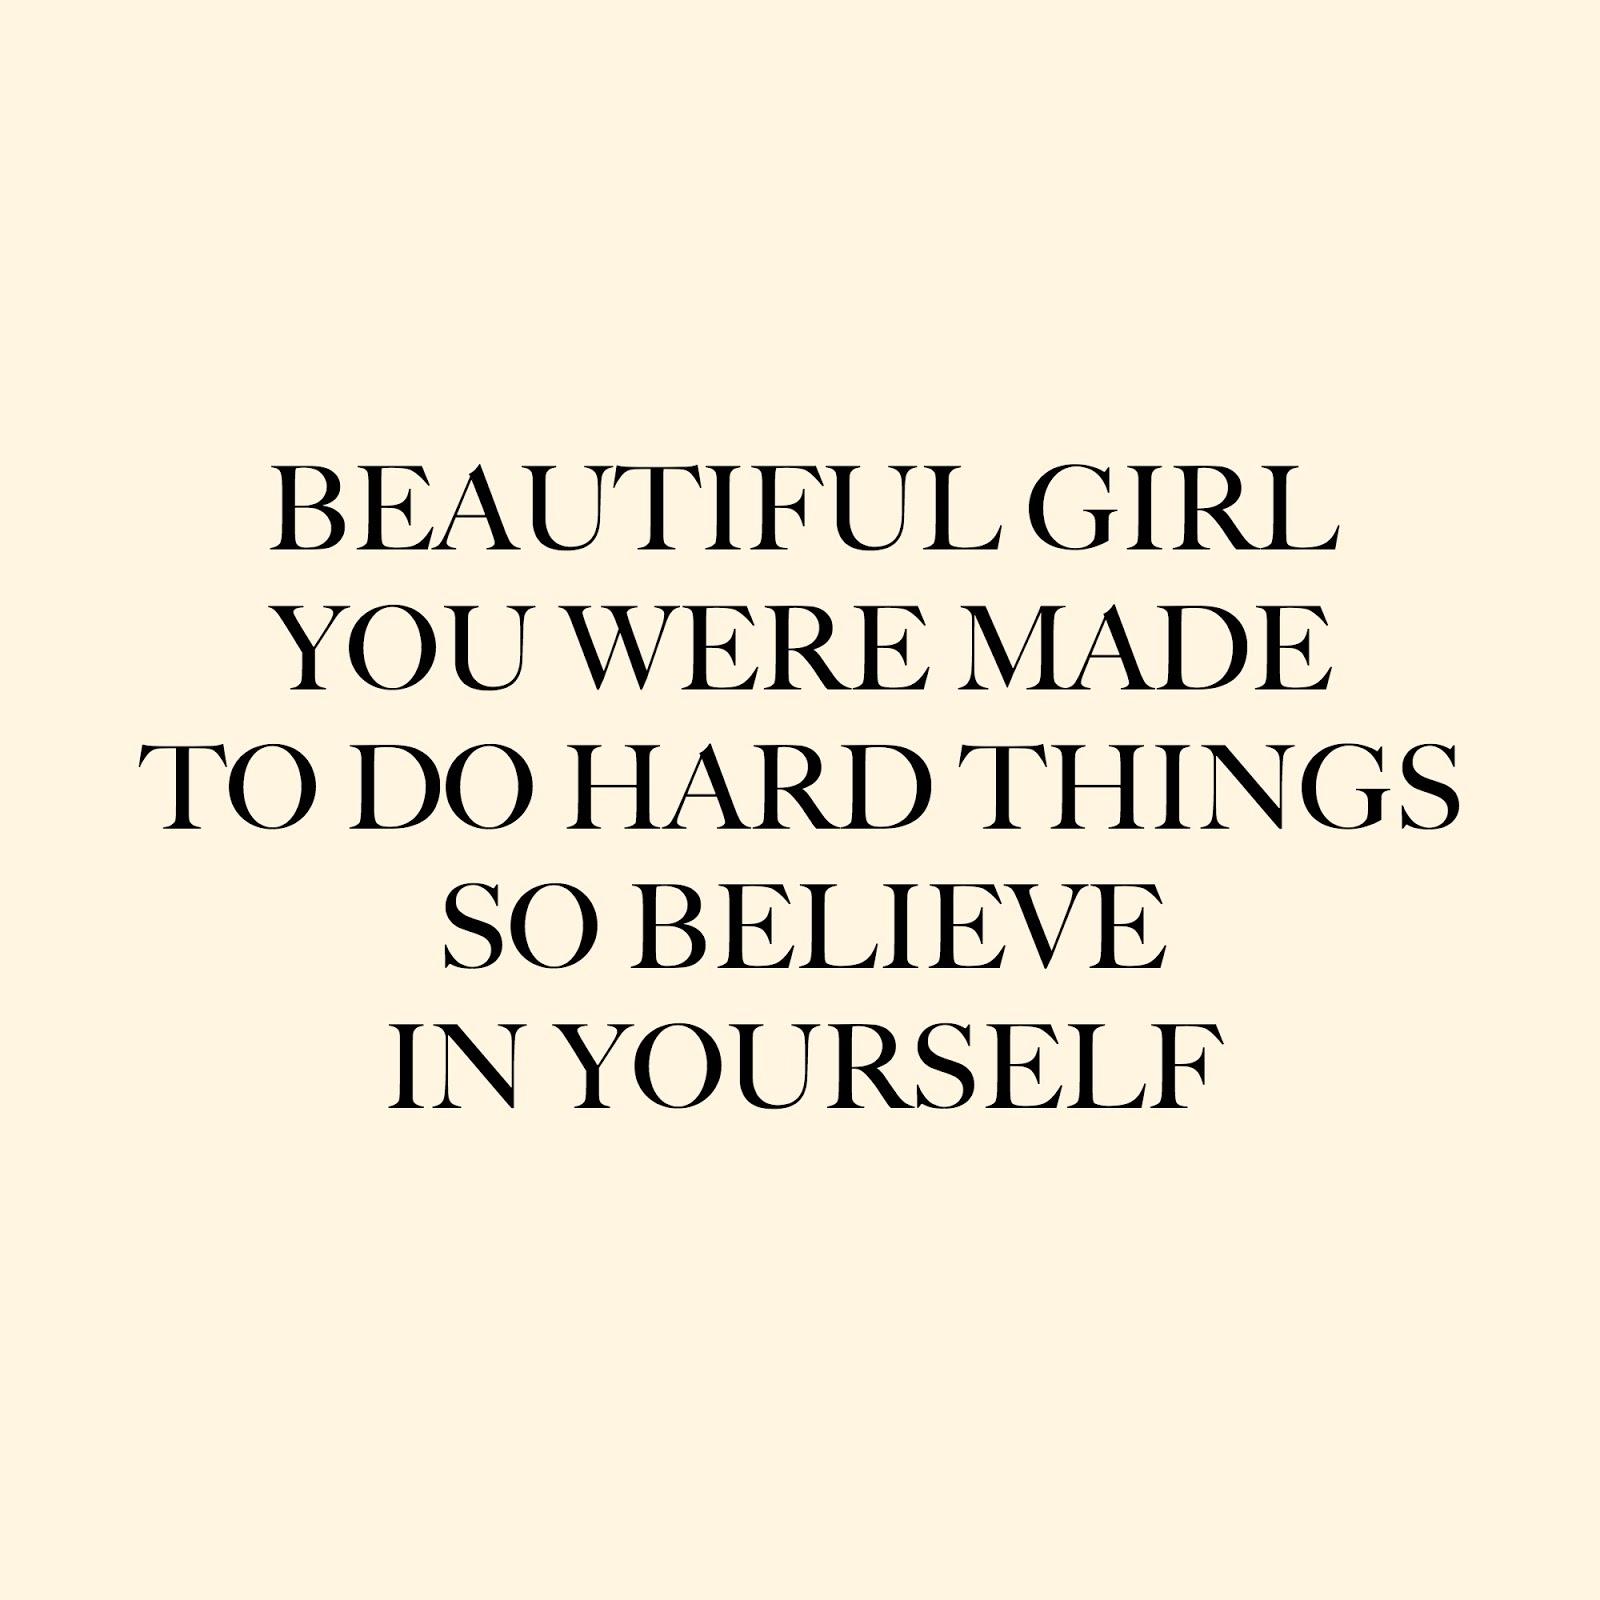 I Can Do Hard Things November 2016